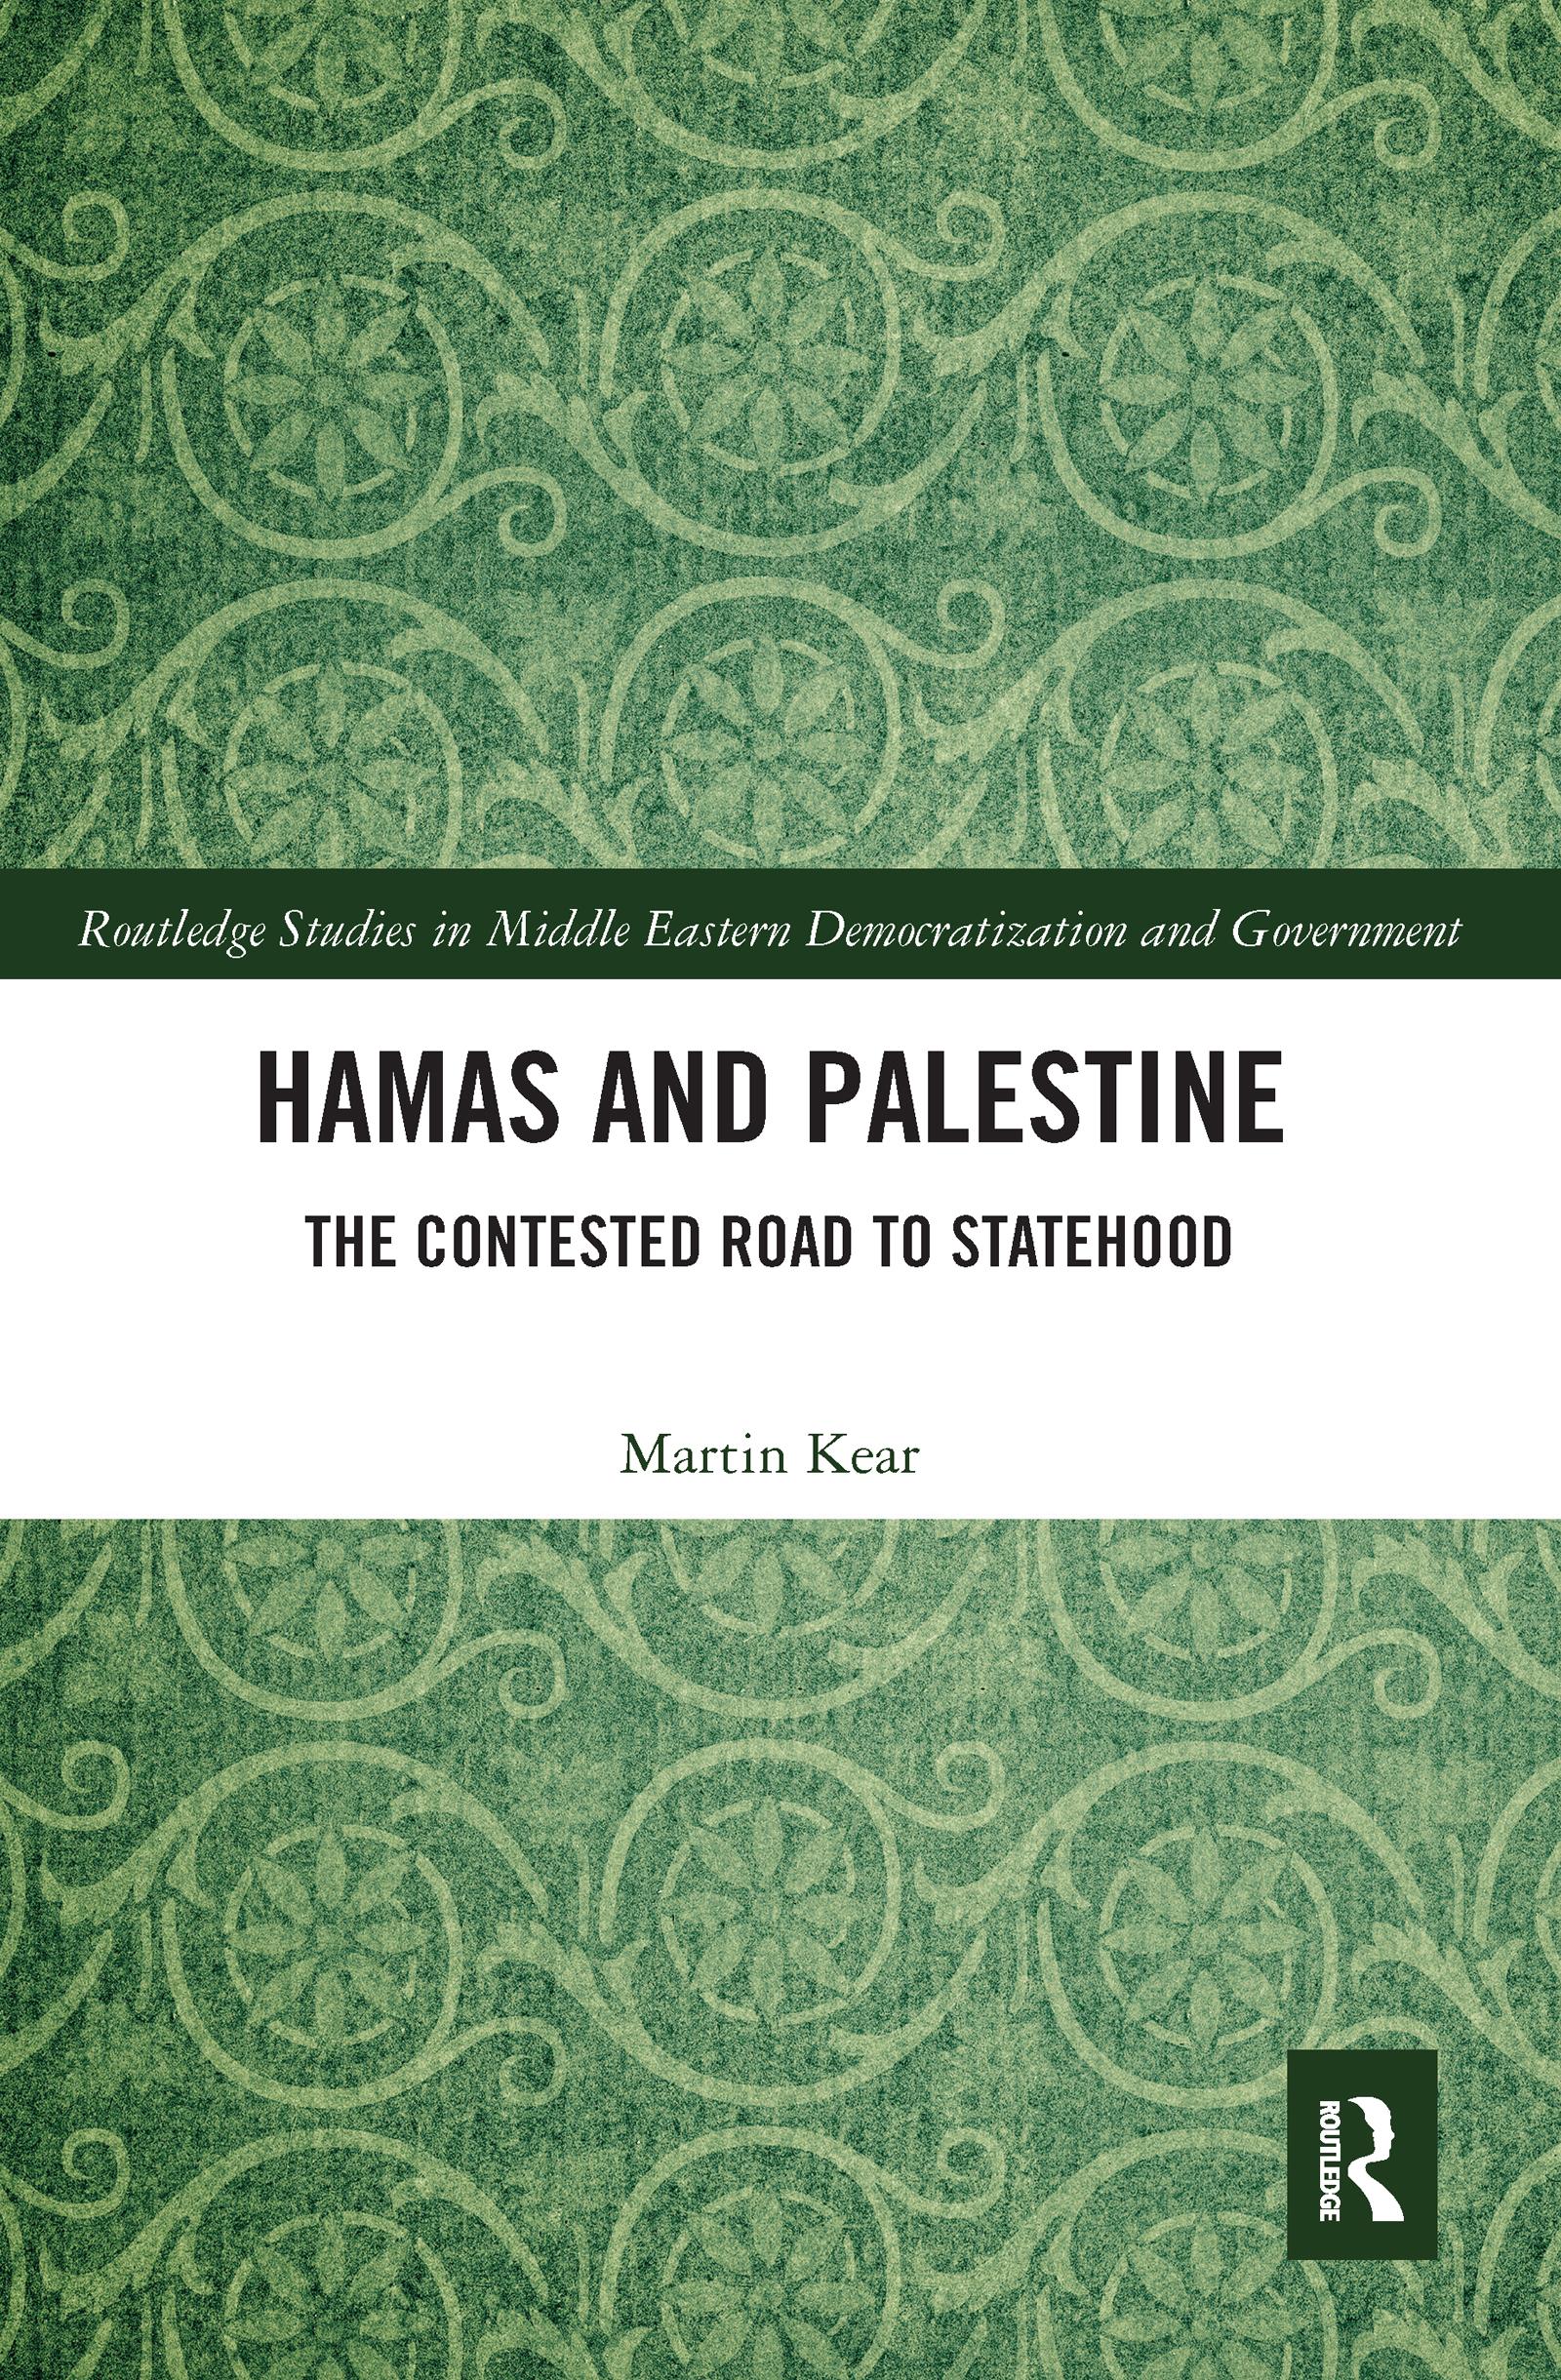 Hamas and Palestine